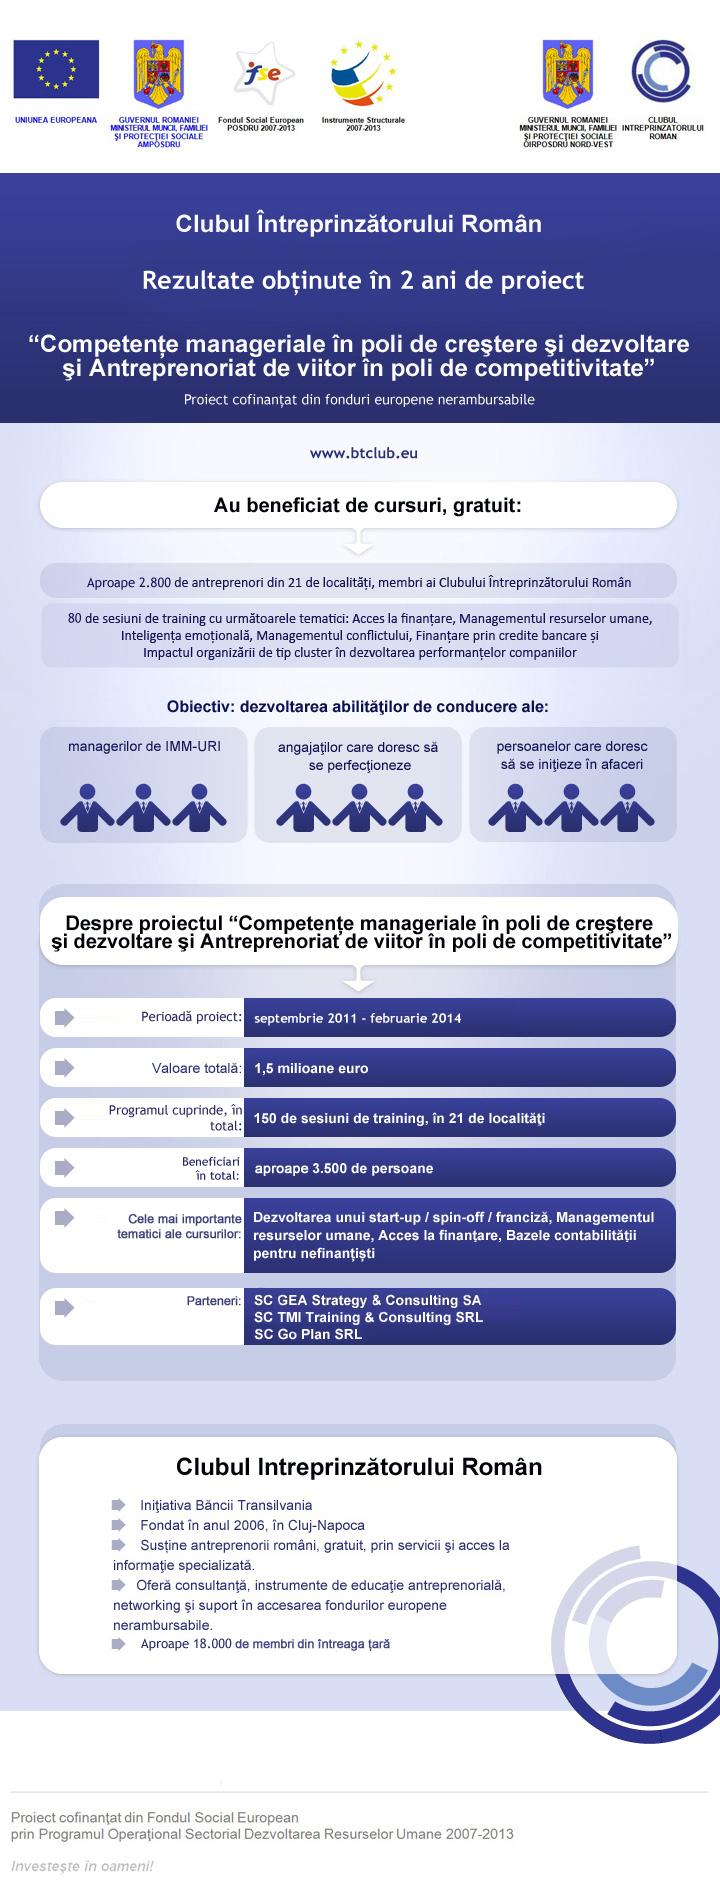 Infografic, Clubul Intreprinzatorului Roman (proiect BT): rezultate program din fonduri europene http://t.co/B6mUPxRFt0